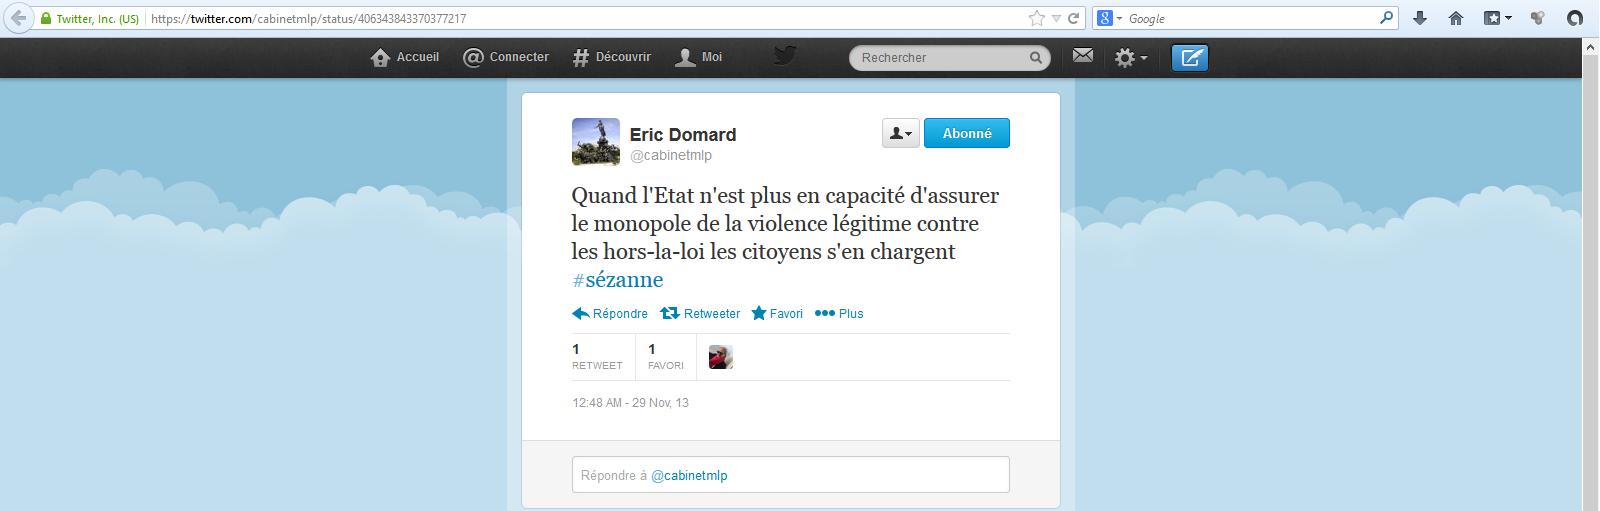 Eric-Domard-29-11-13-Violence-legitime